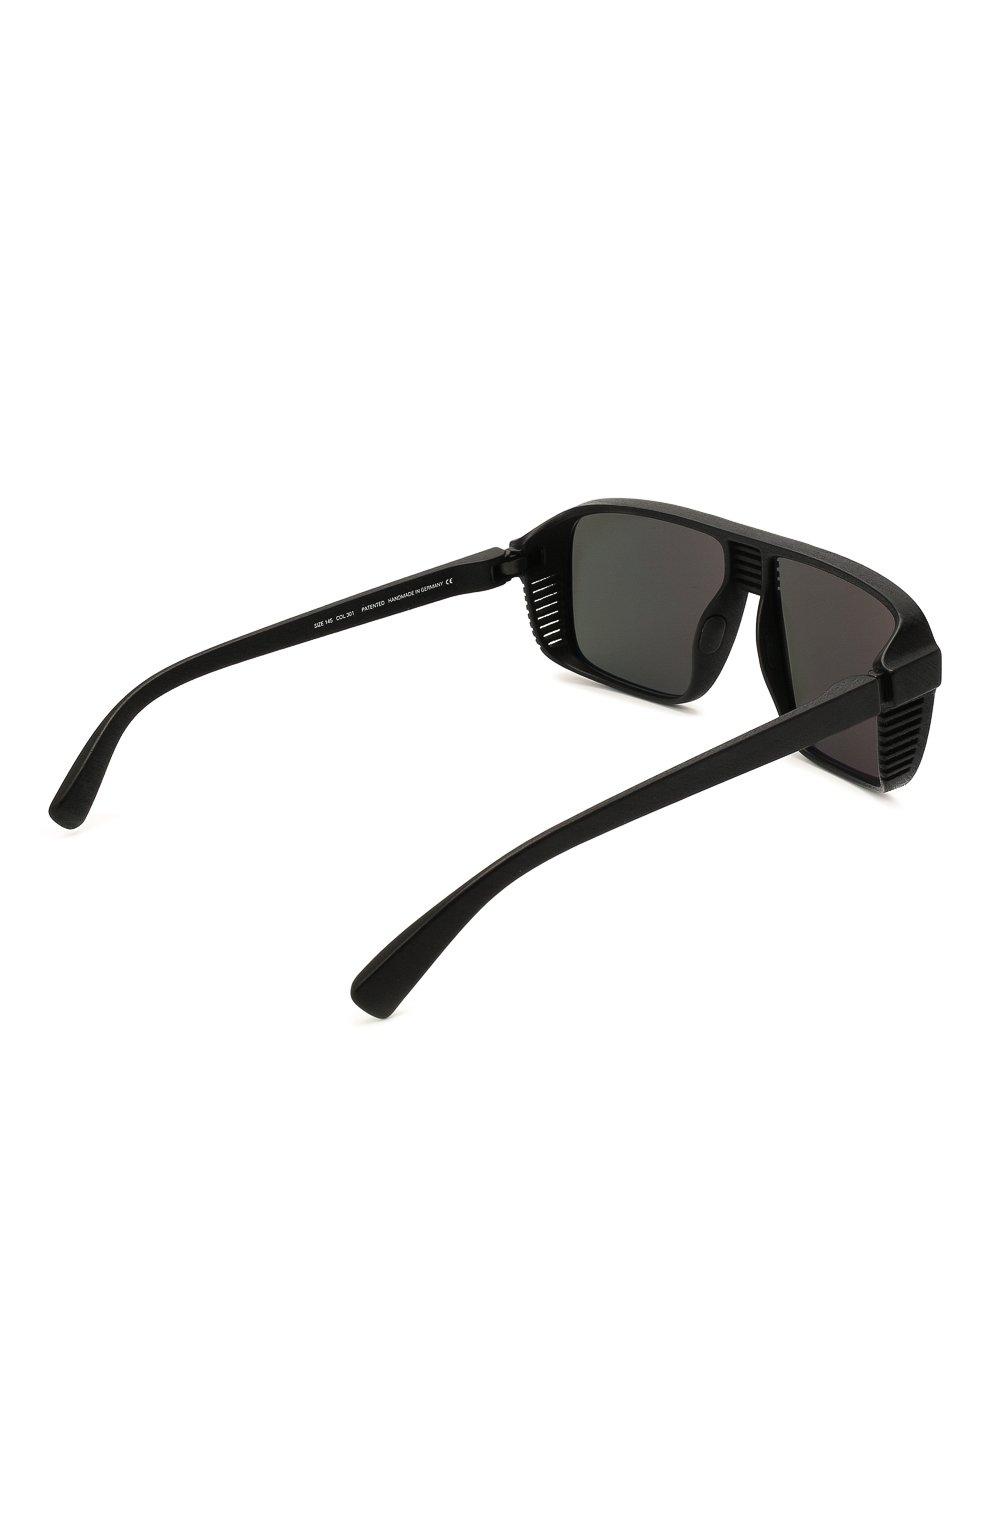 Мужские солнцезащитные очки MYKITA MYLON черного цвета, арт. CANY0N/PITCH BLACK | Фото 4